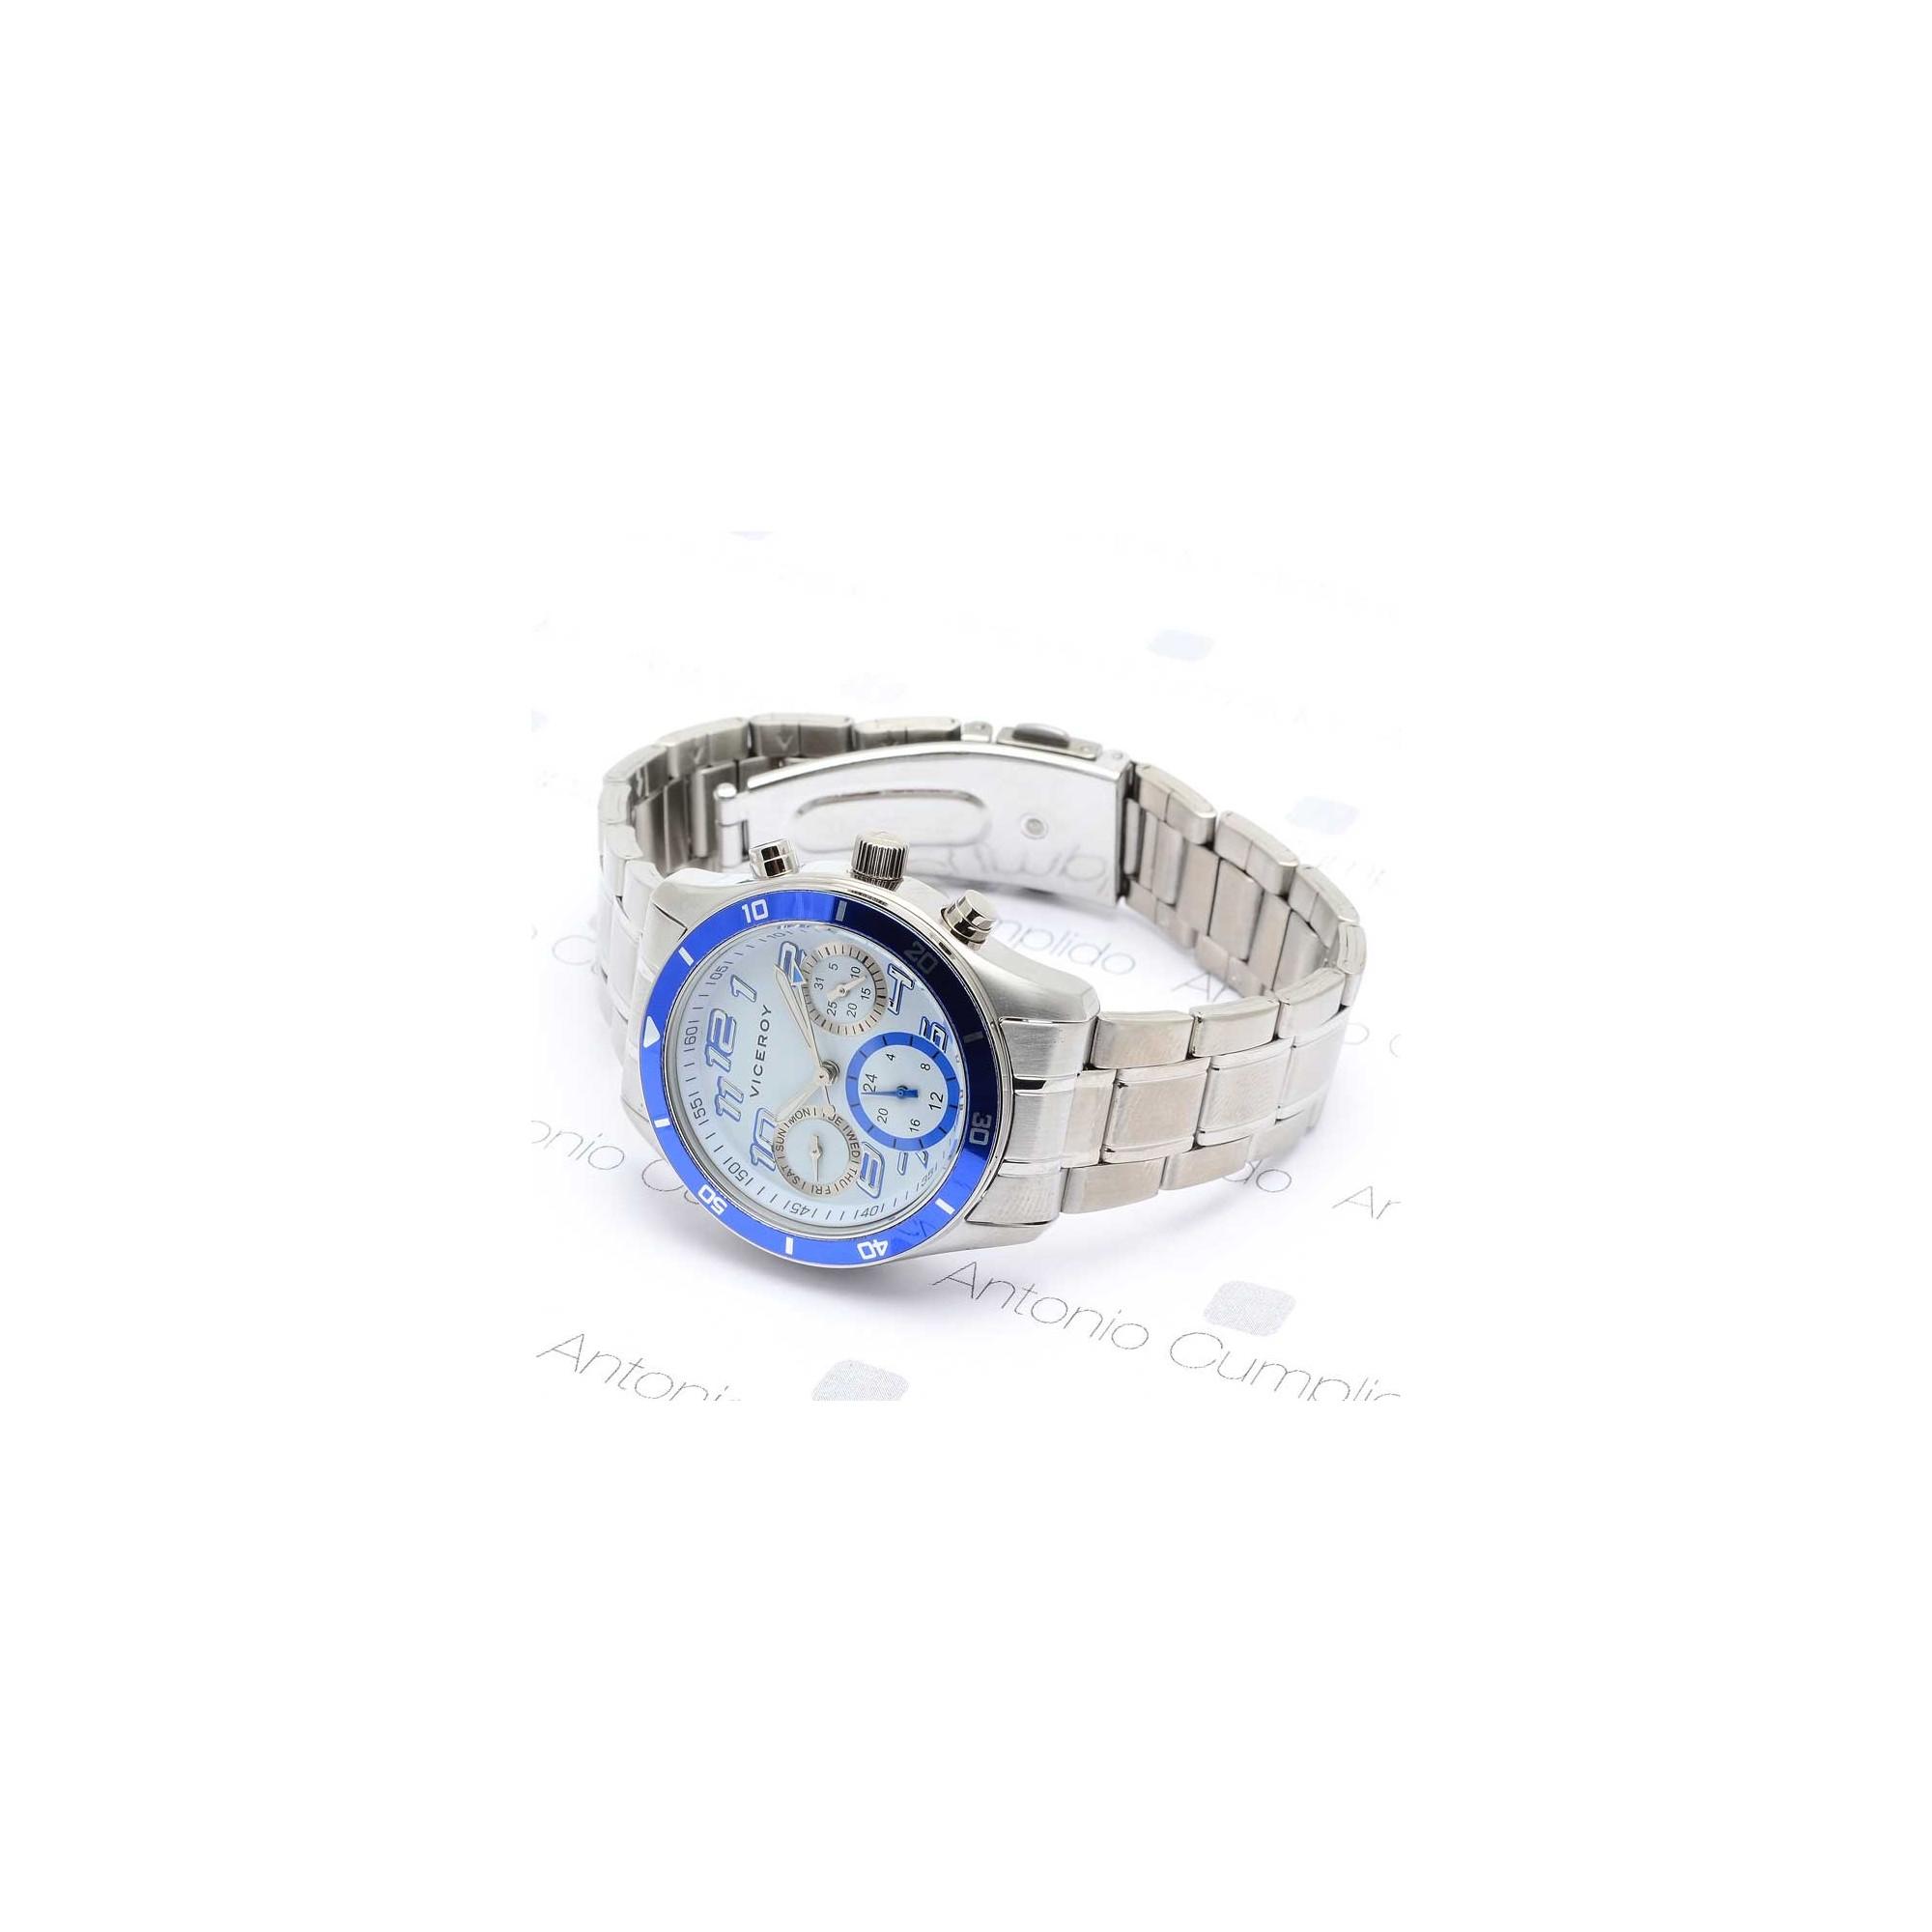 ac03b7b1aa6b Reloj Viceroy Cadete Niño Comunión Azul Brazalete Acero Multifunción ...